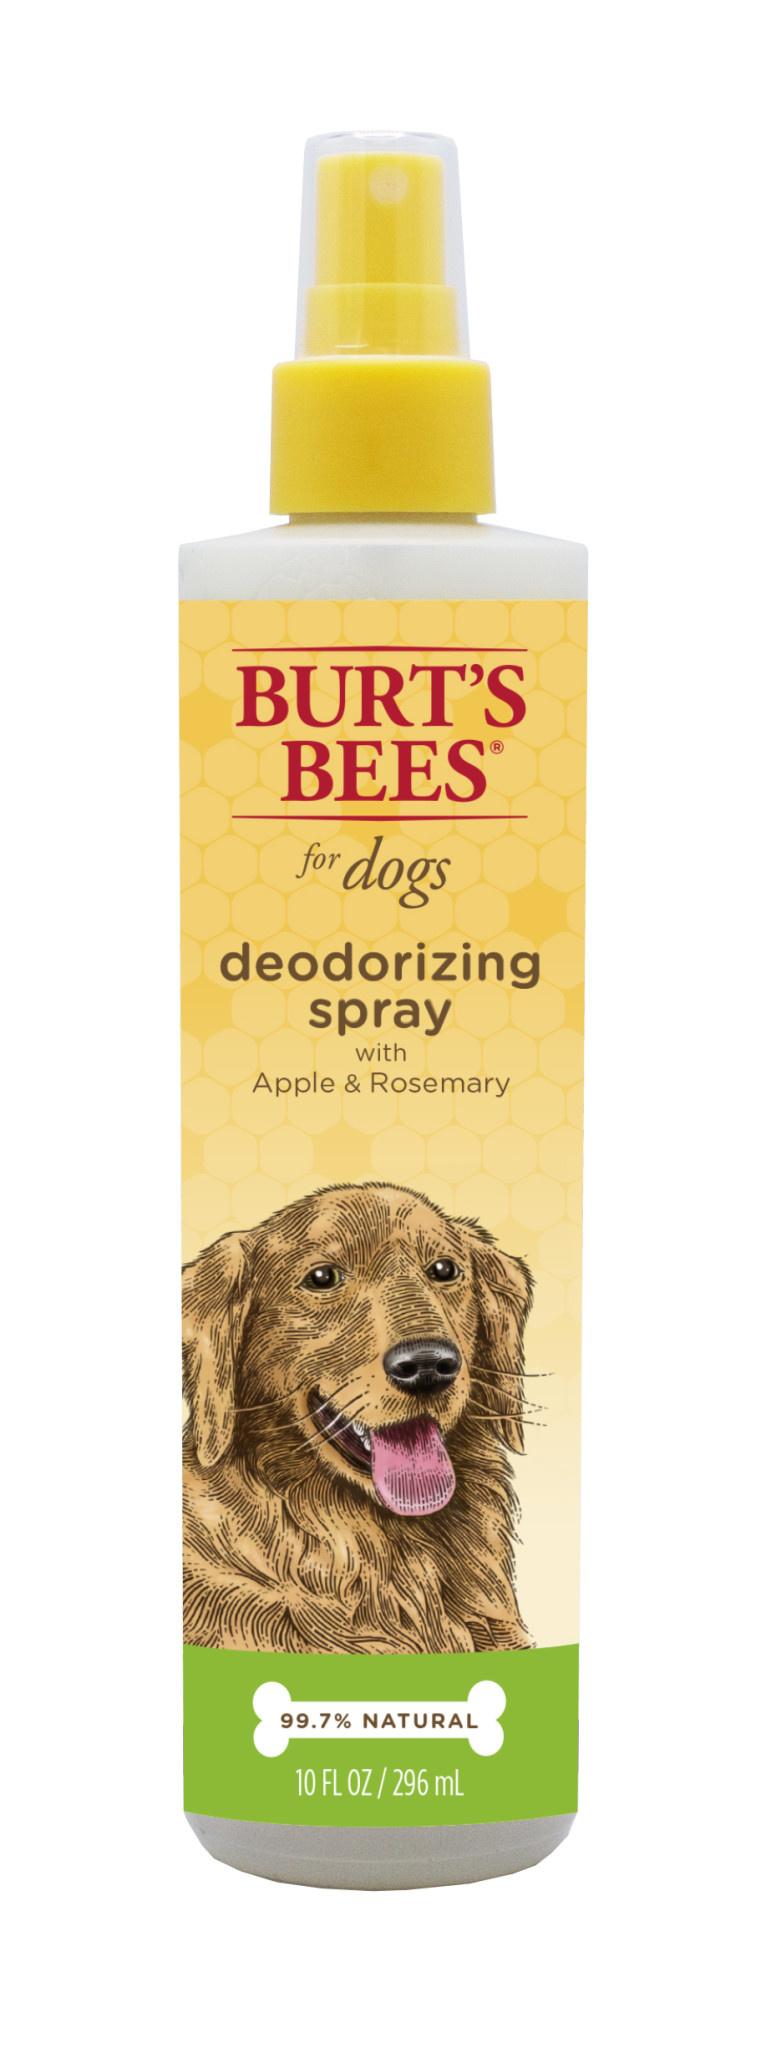 Burt's Bees Burt's Bees Deodorizing Spray 10 oz